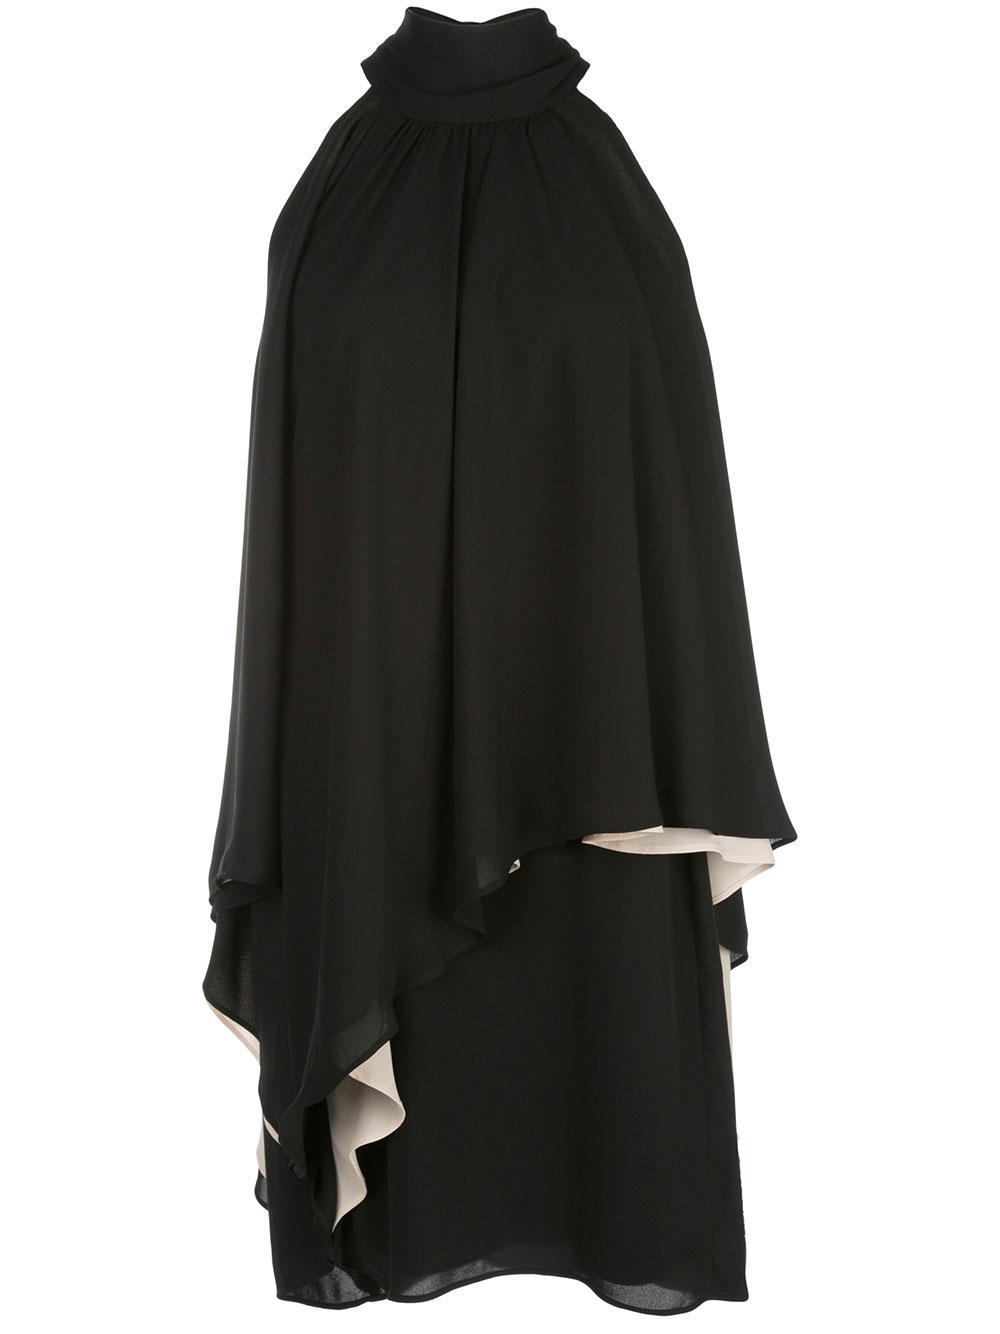 Mock Neck Versatile Dress